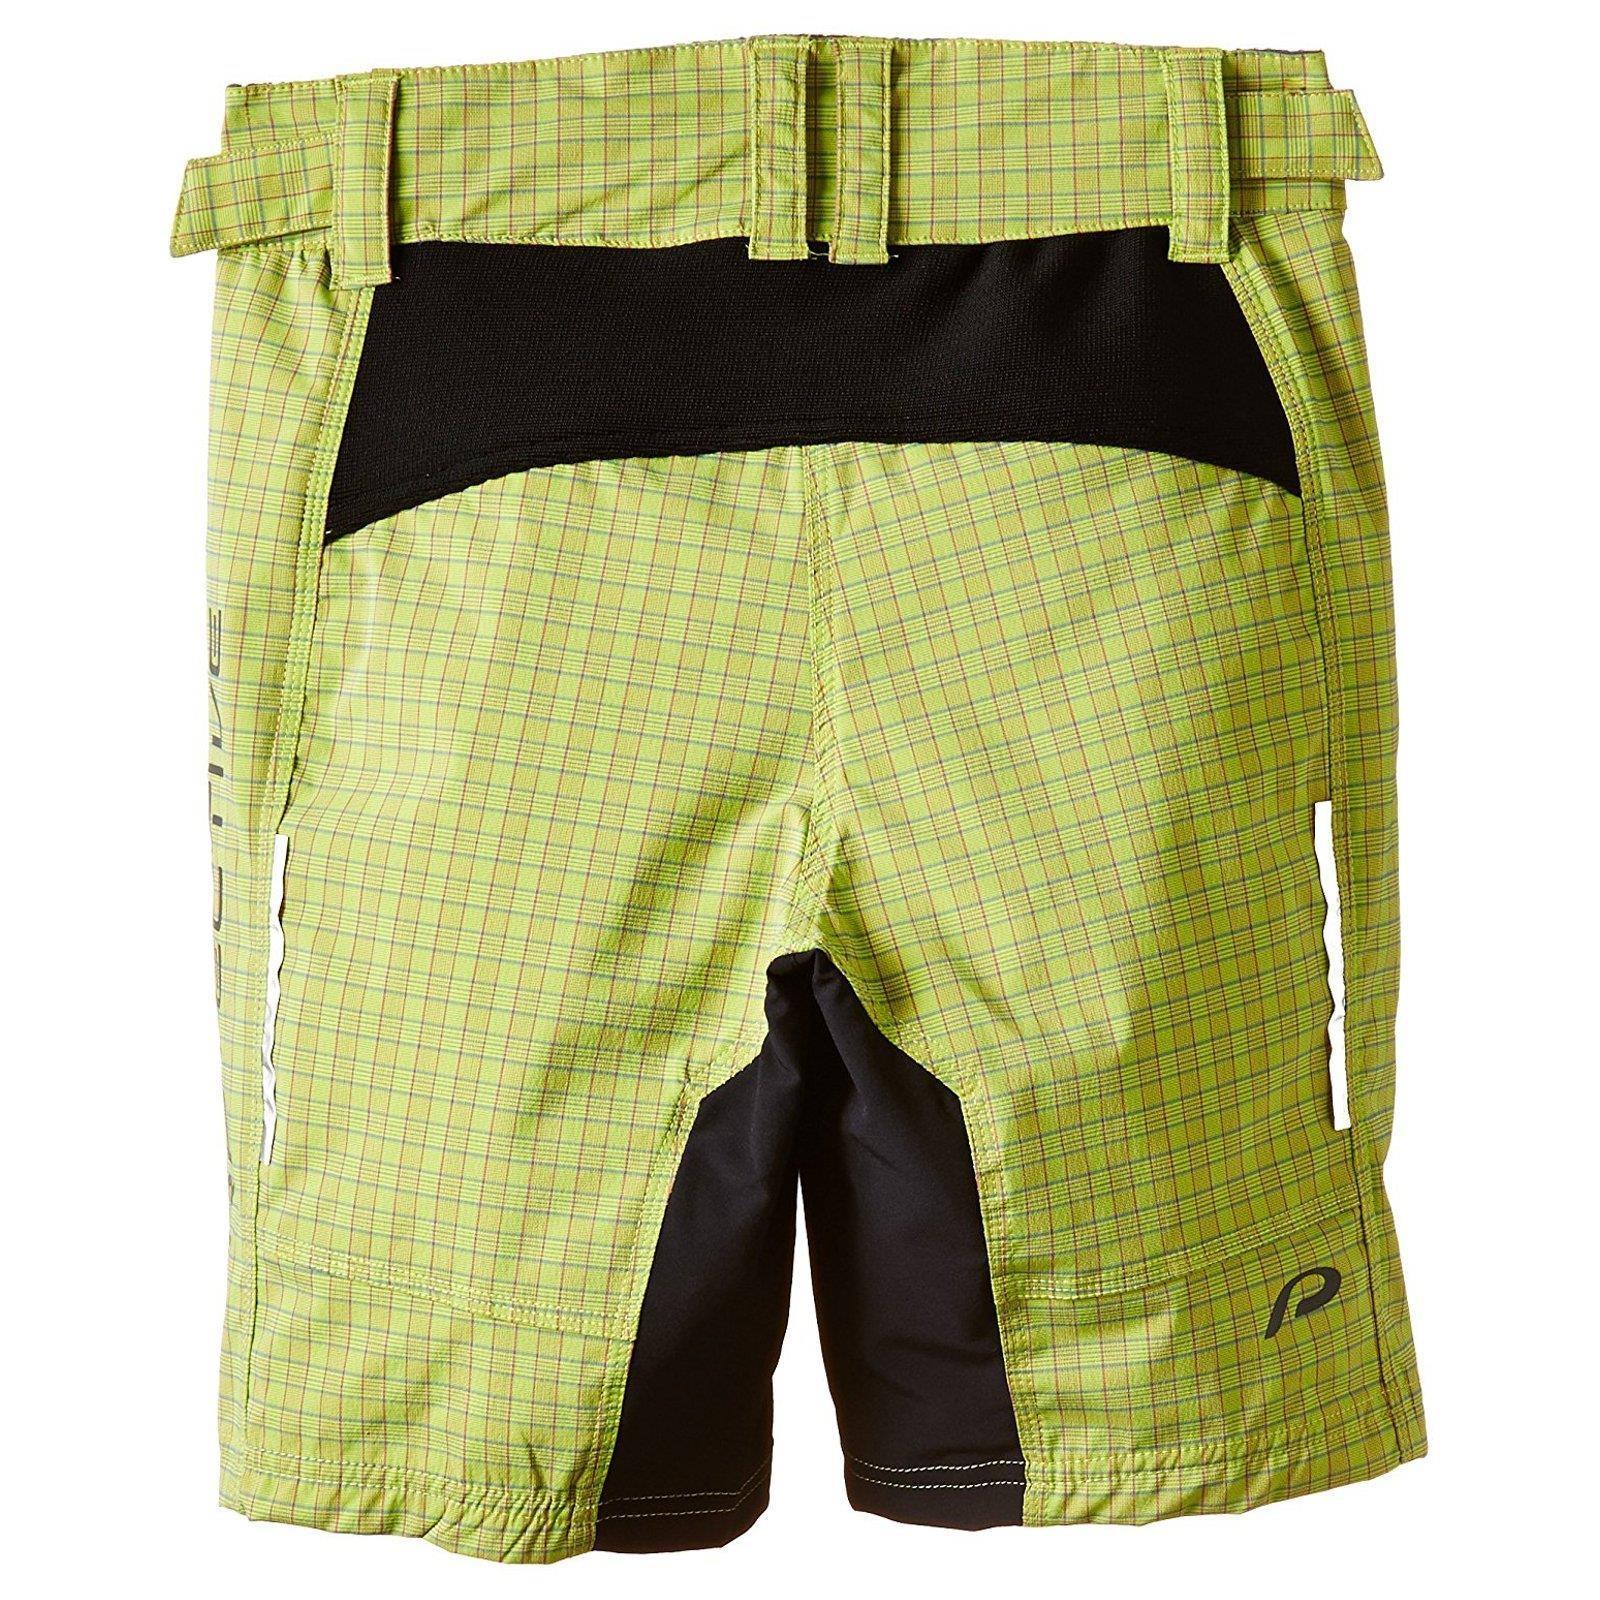 protective checker damen shorts hose kurz mountain bike fahrrad taschen trekking ebay. Black Bedroom Furniture Sets. Home Design Ideas